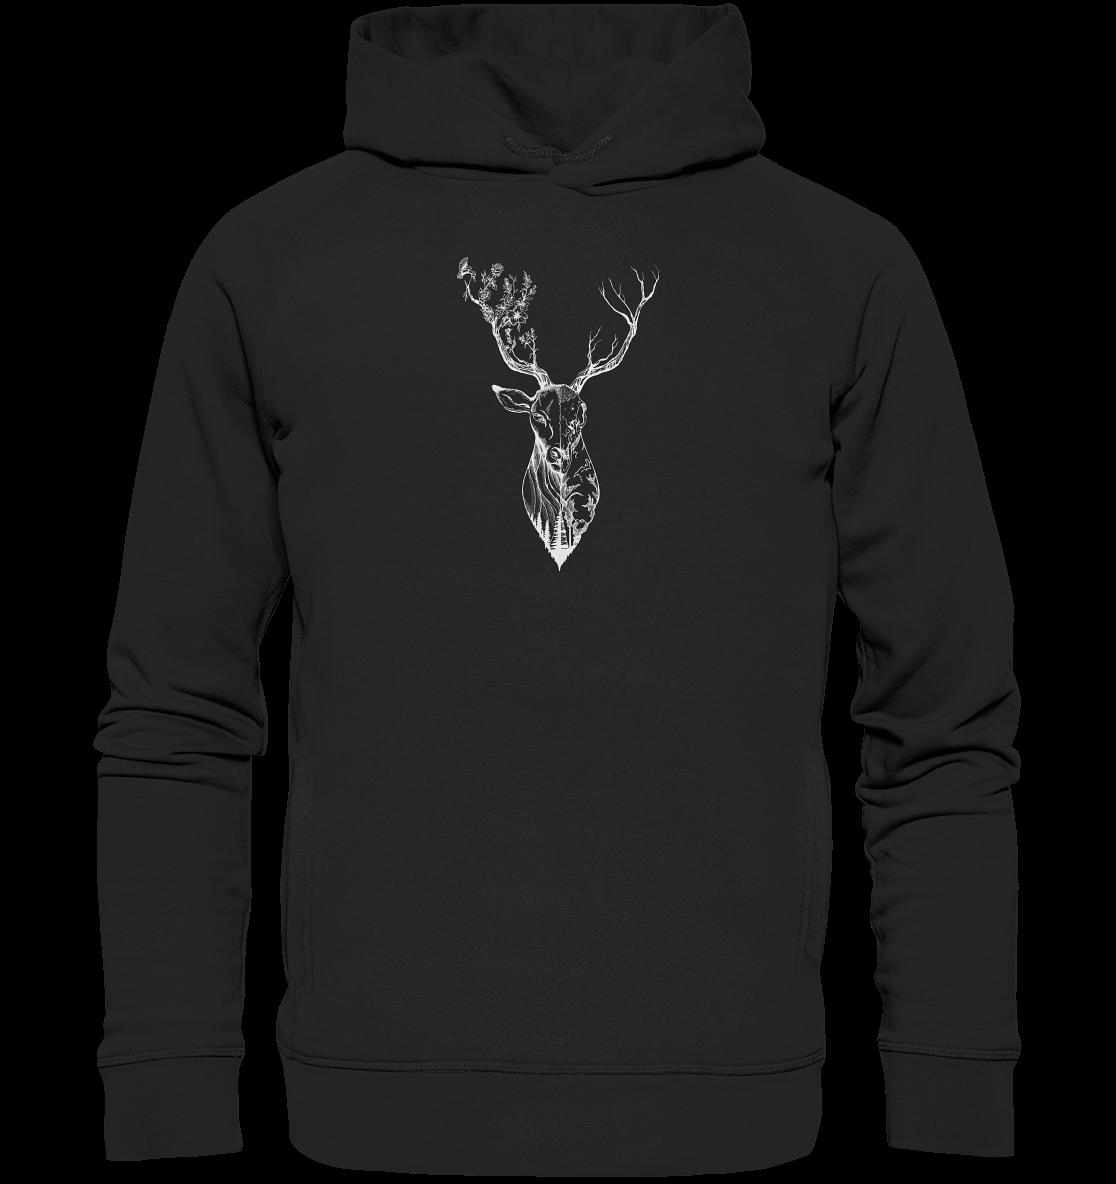 front-organic-fashion-hoodie-272727-1116x-7.png